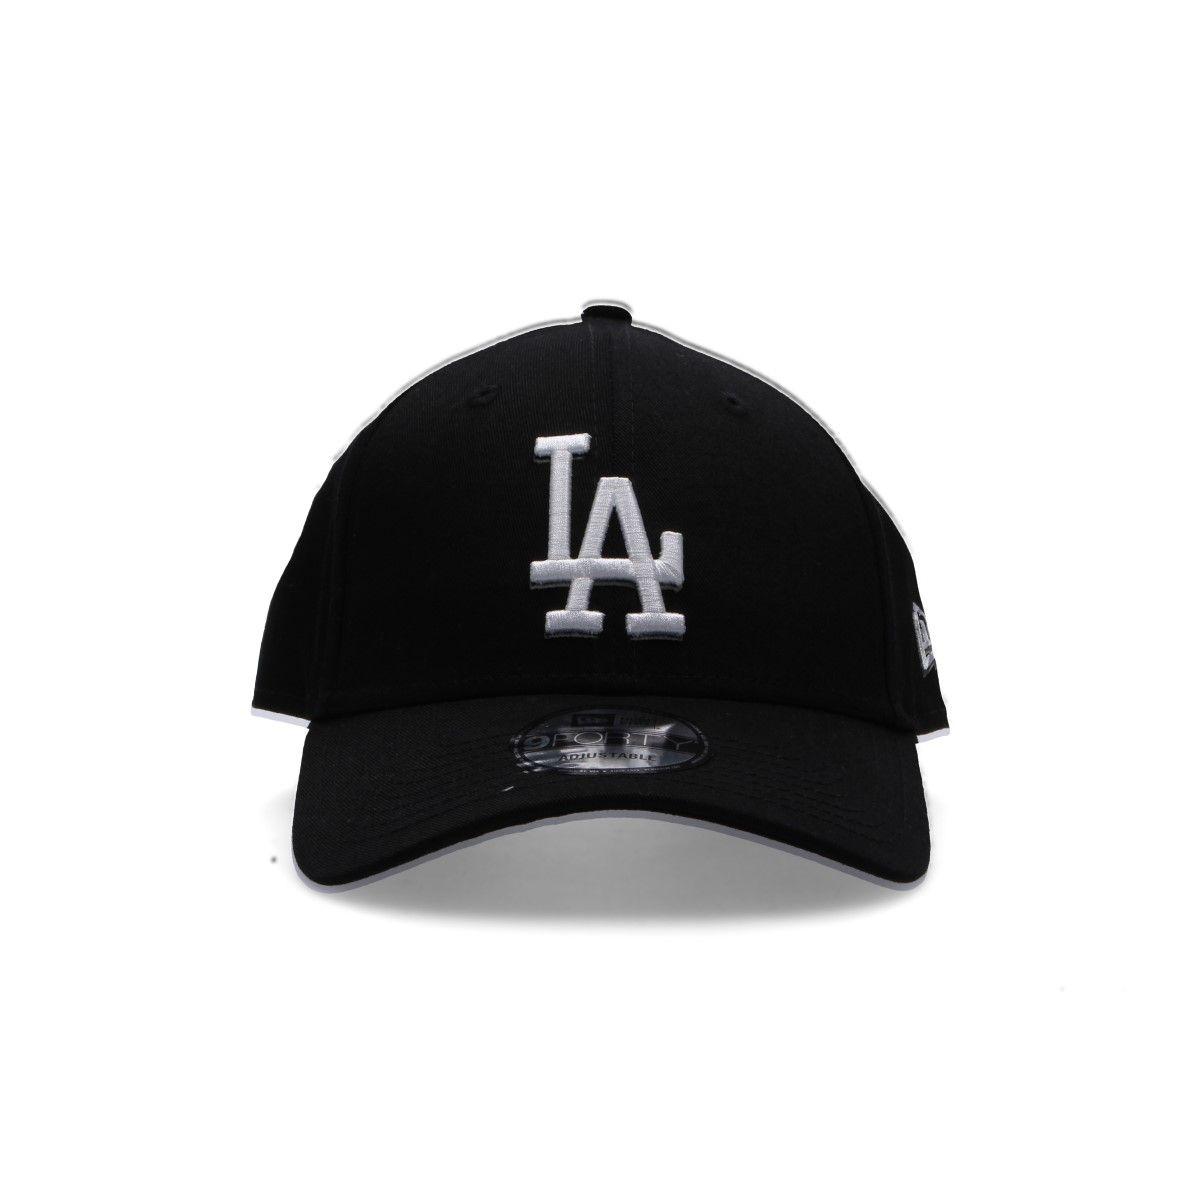 New Era Black Fabric Hat